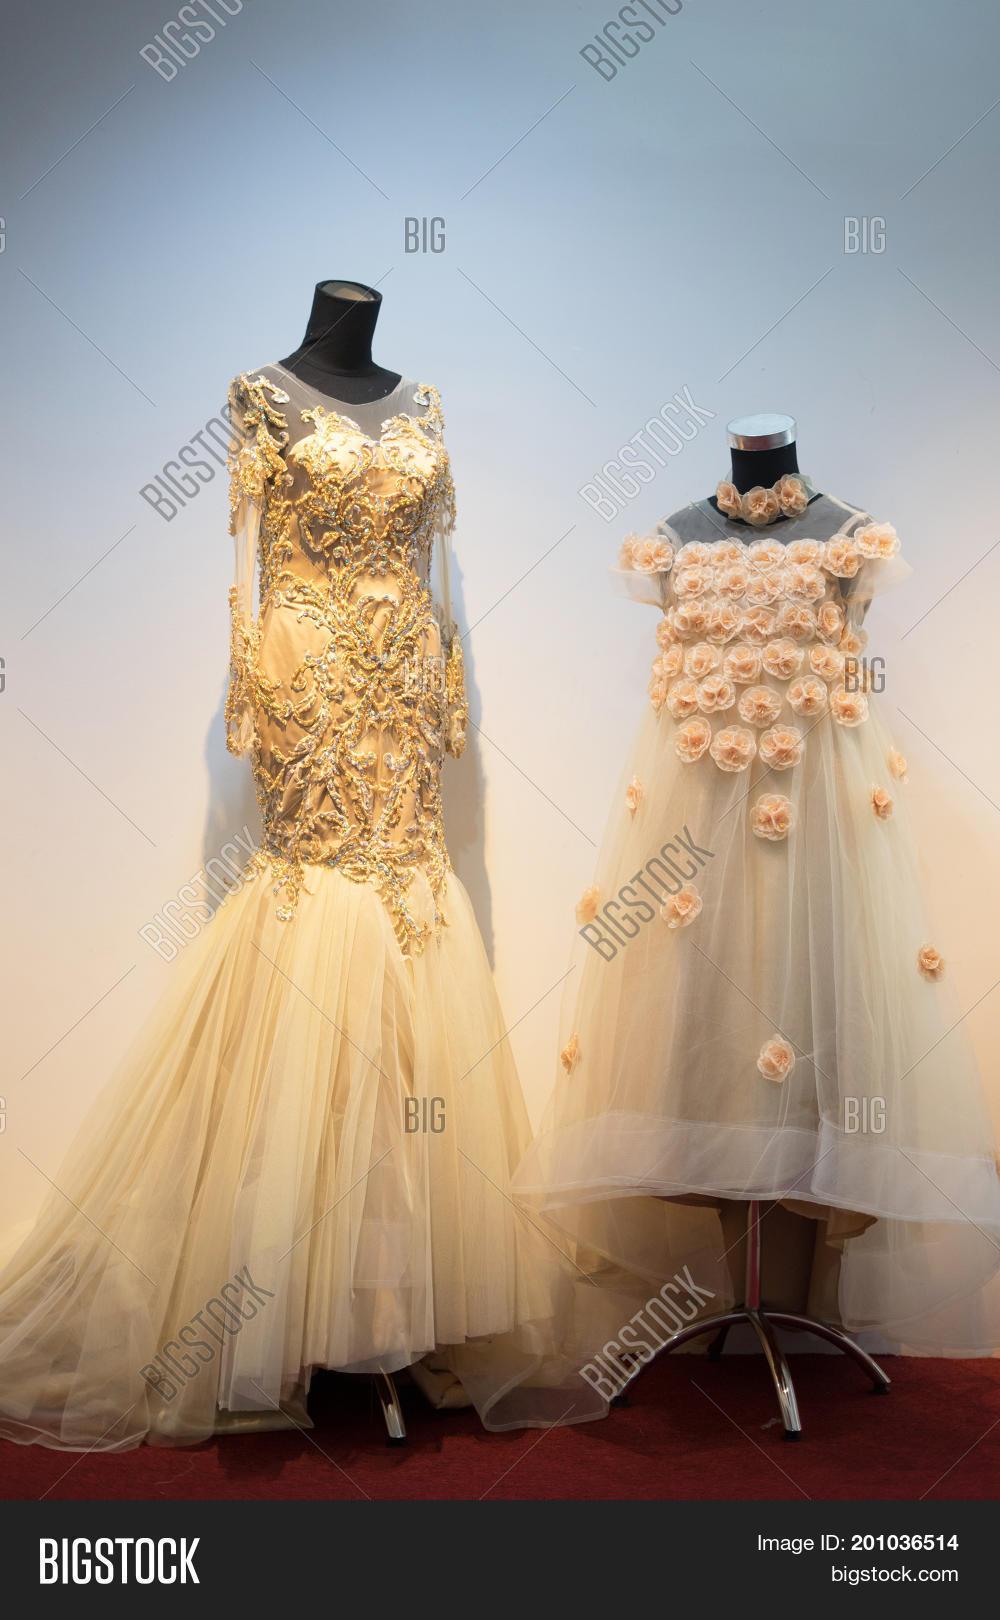 Set Wedding Dress Gown Mom Kids Image & Photo | Bigstock